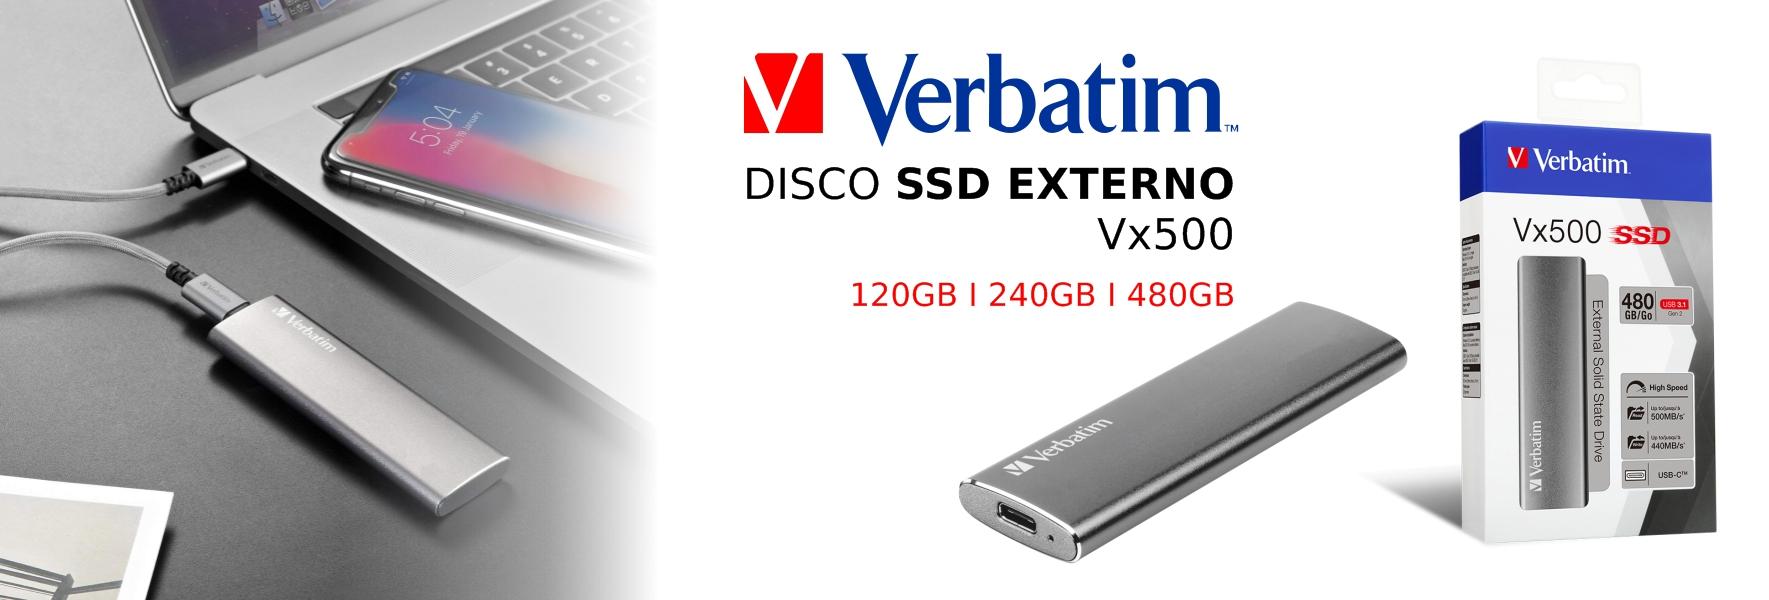 Banner Verbatim Discos SSD